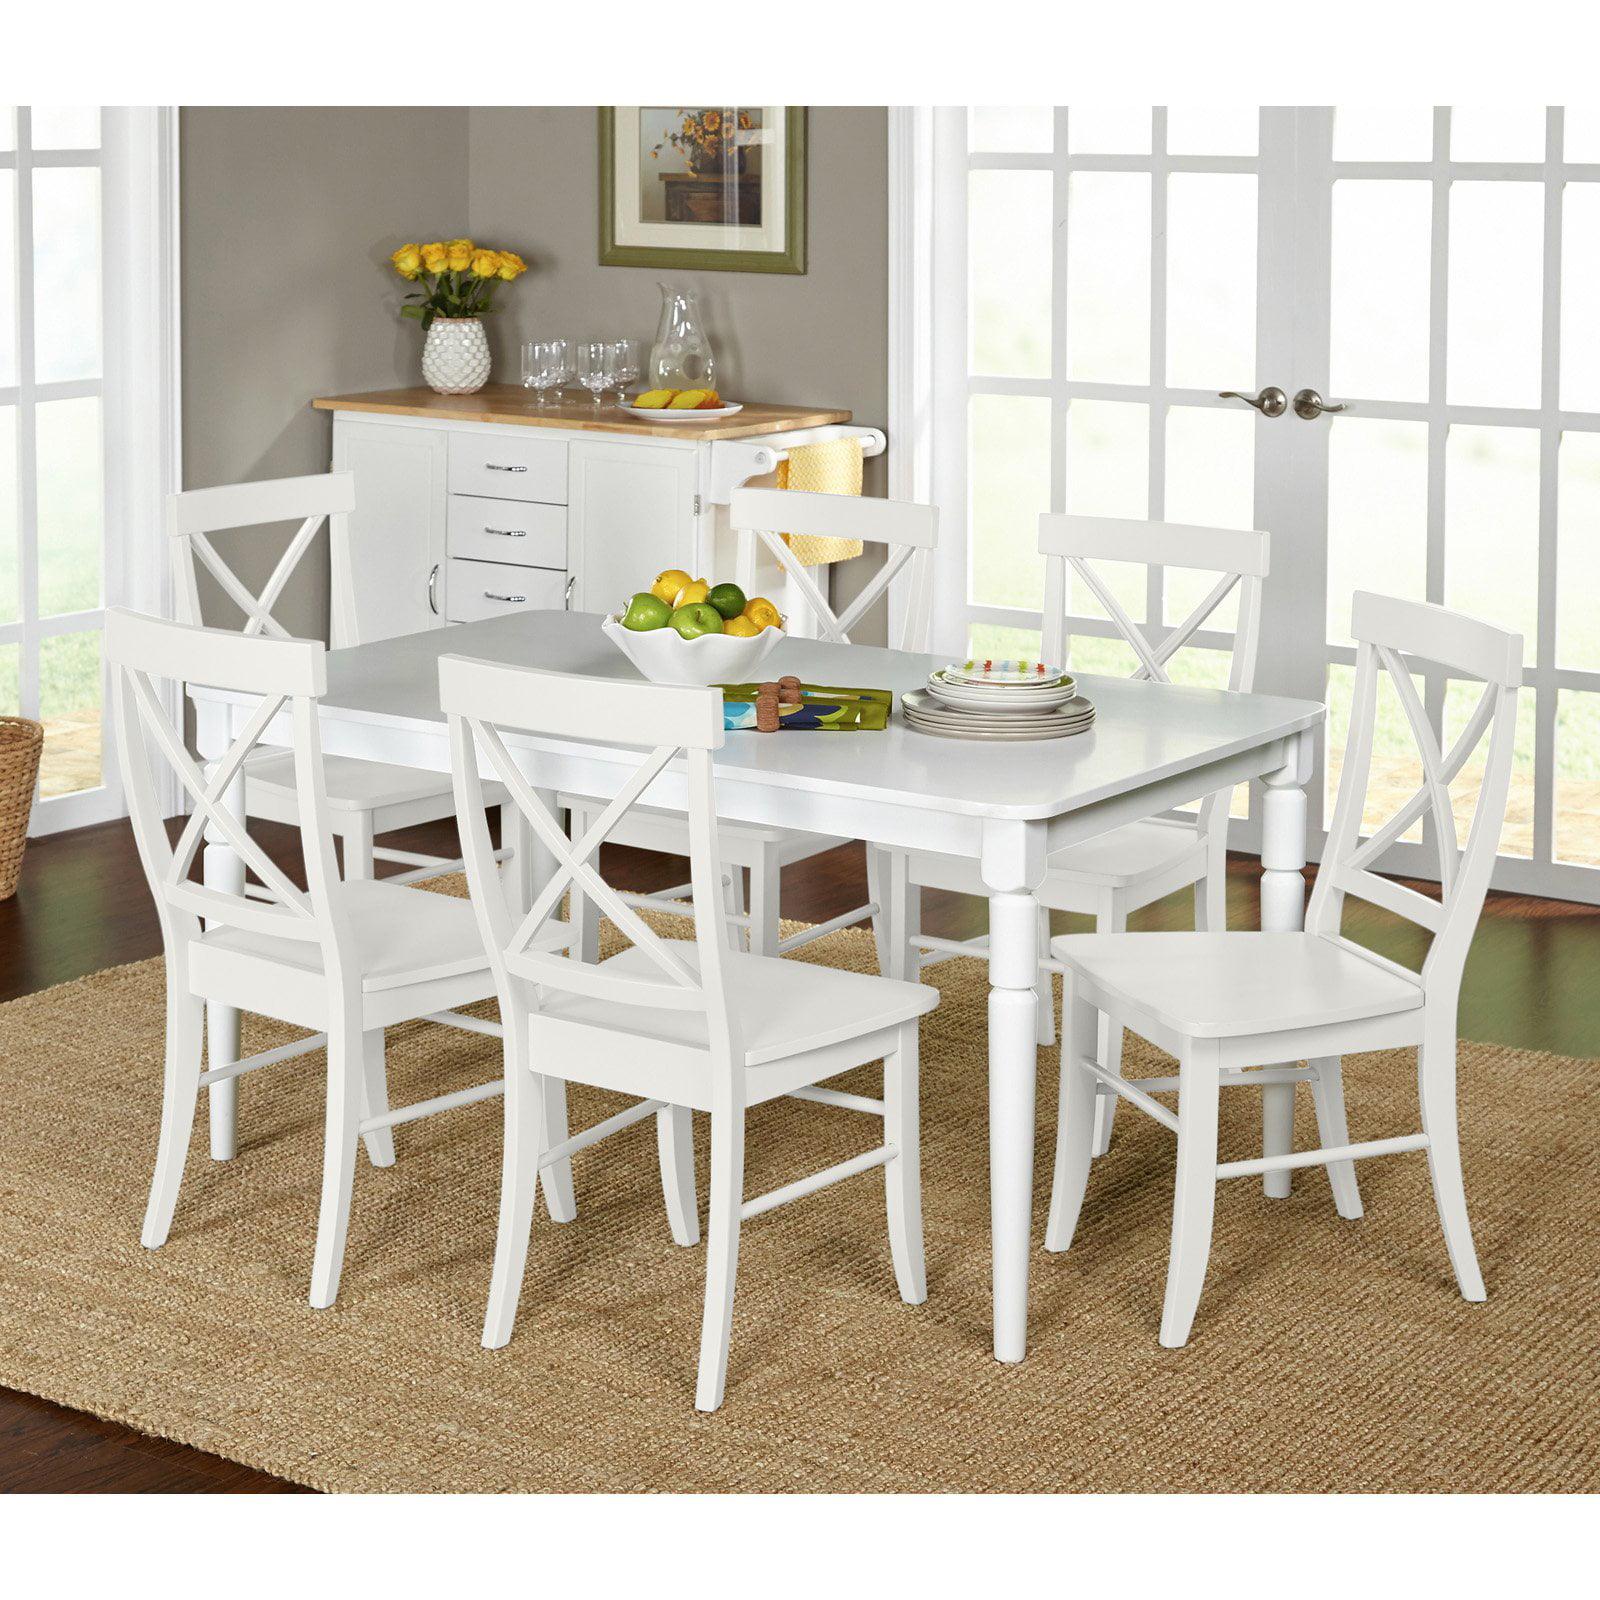 Target Marketing Systems Albury 7 Piece Dining Table Set Walmart Com